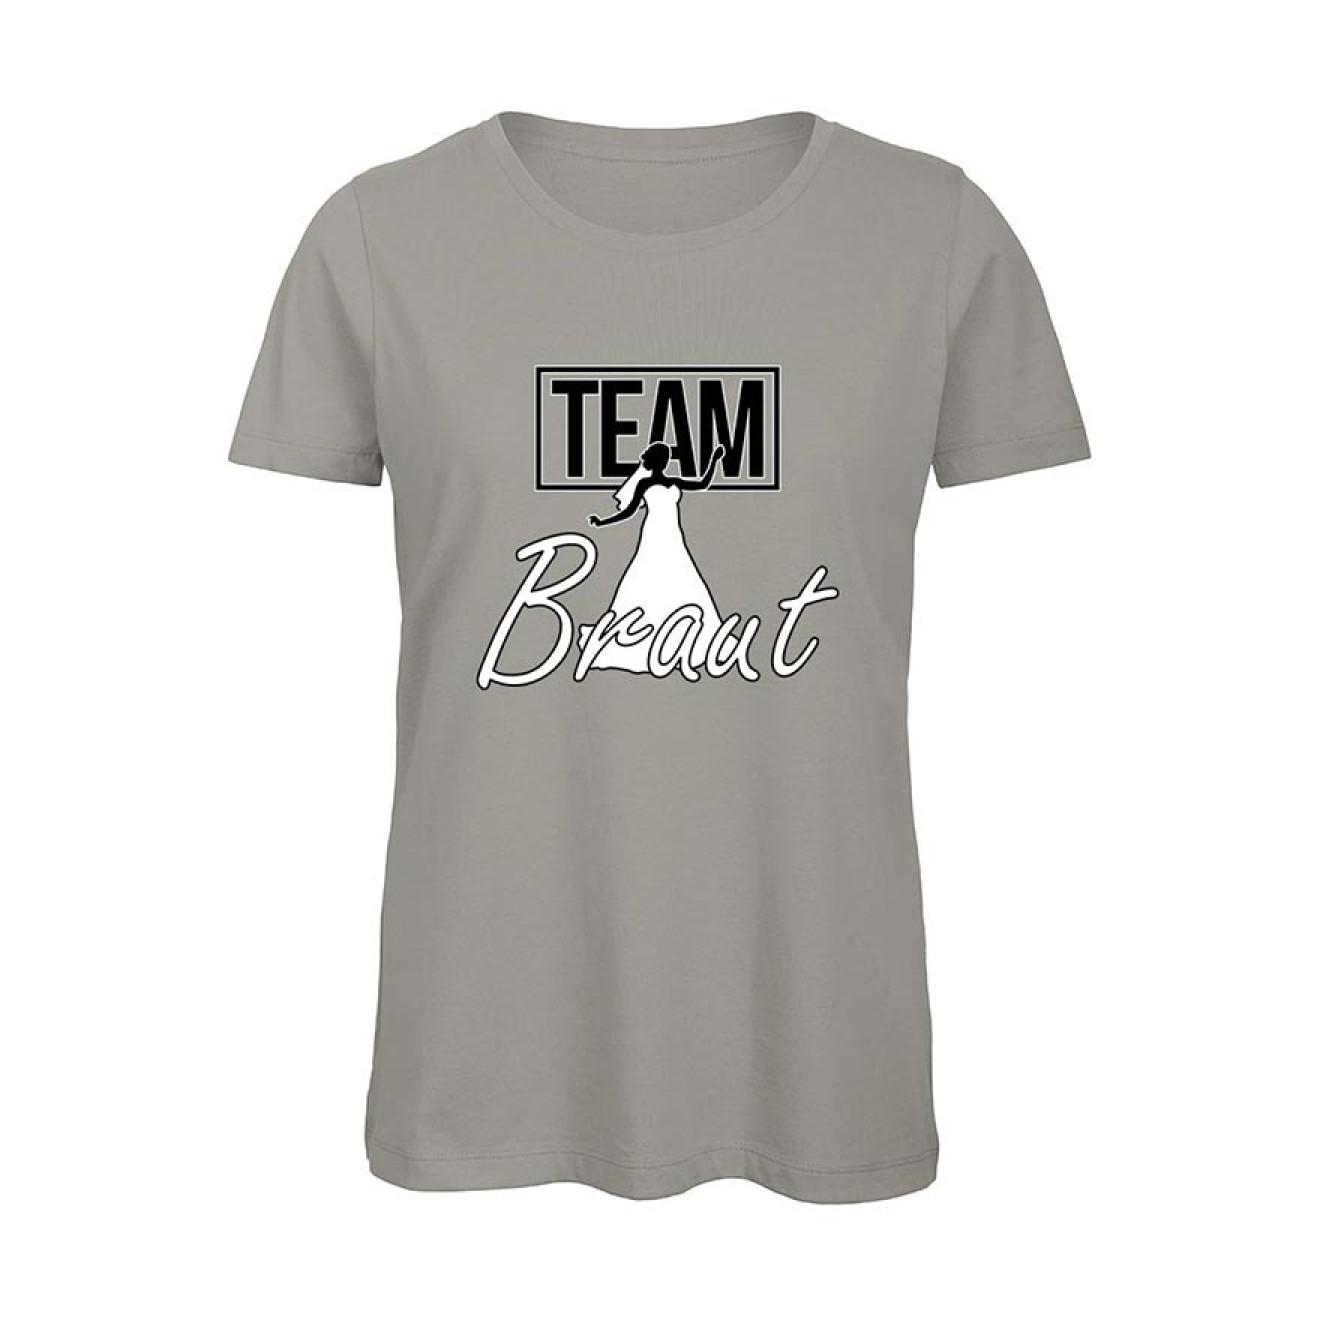 Polterabend T-Shirts | Polterabend Tshirt Team Braut